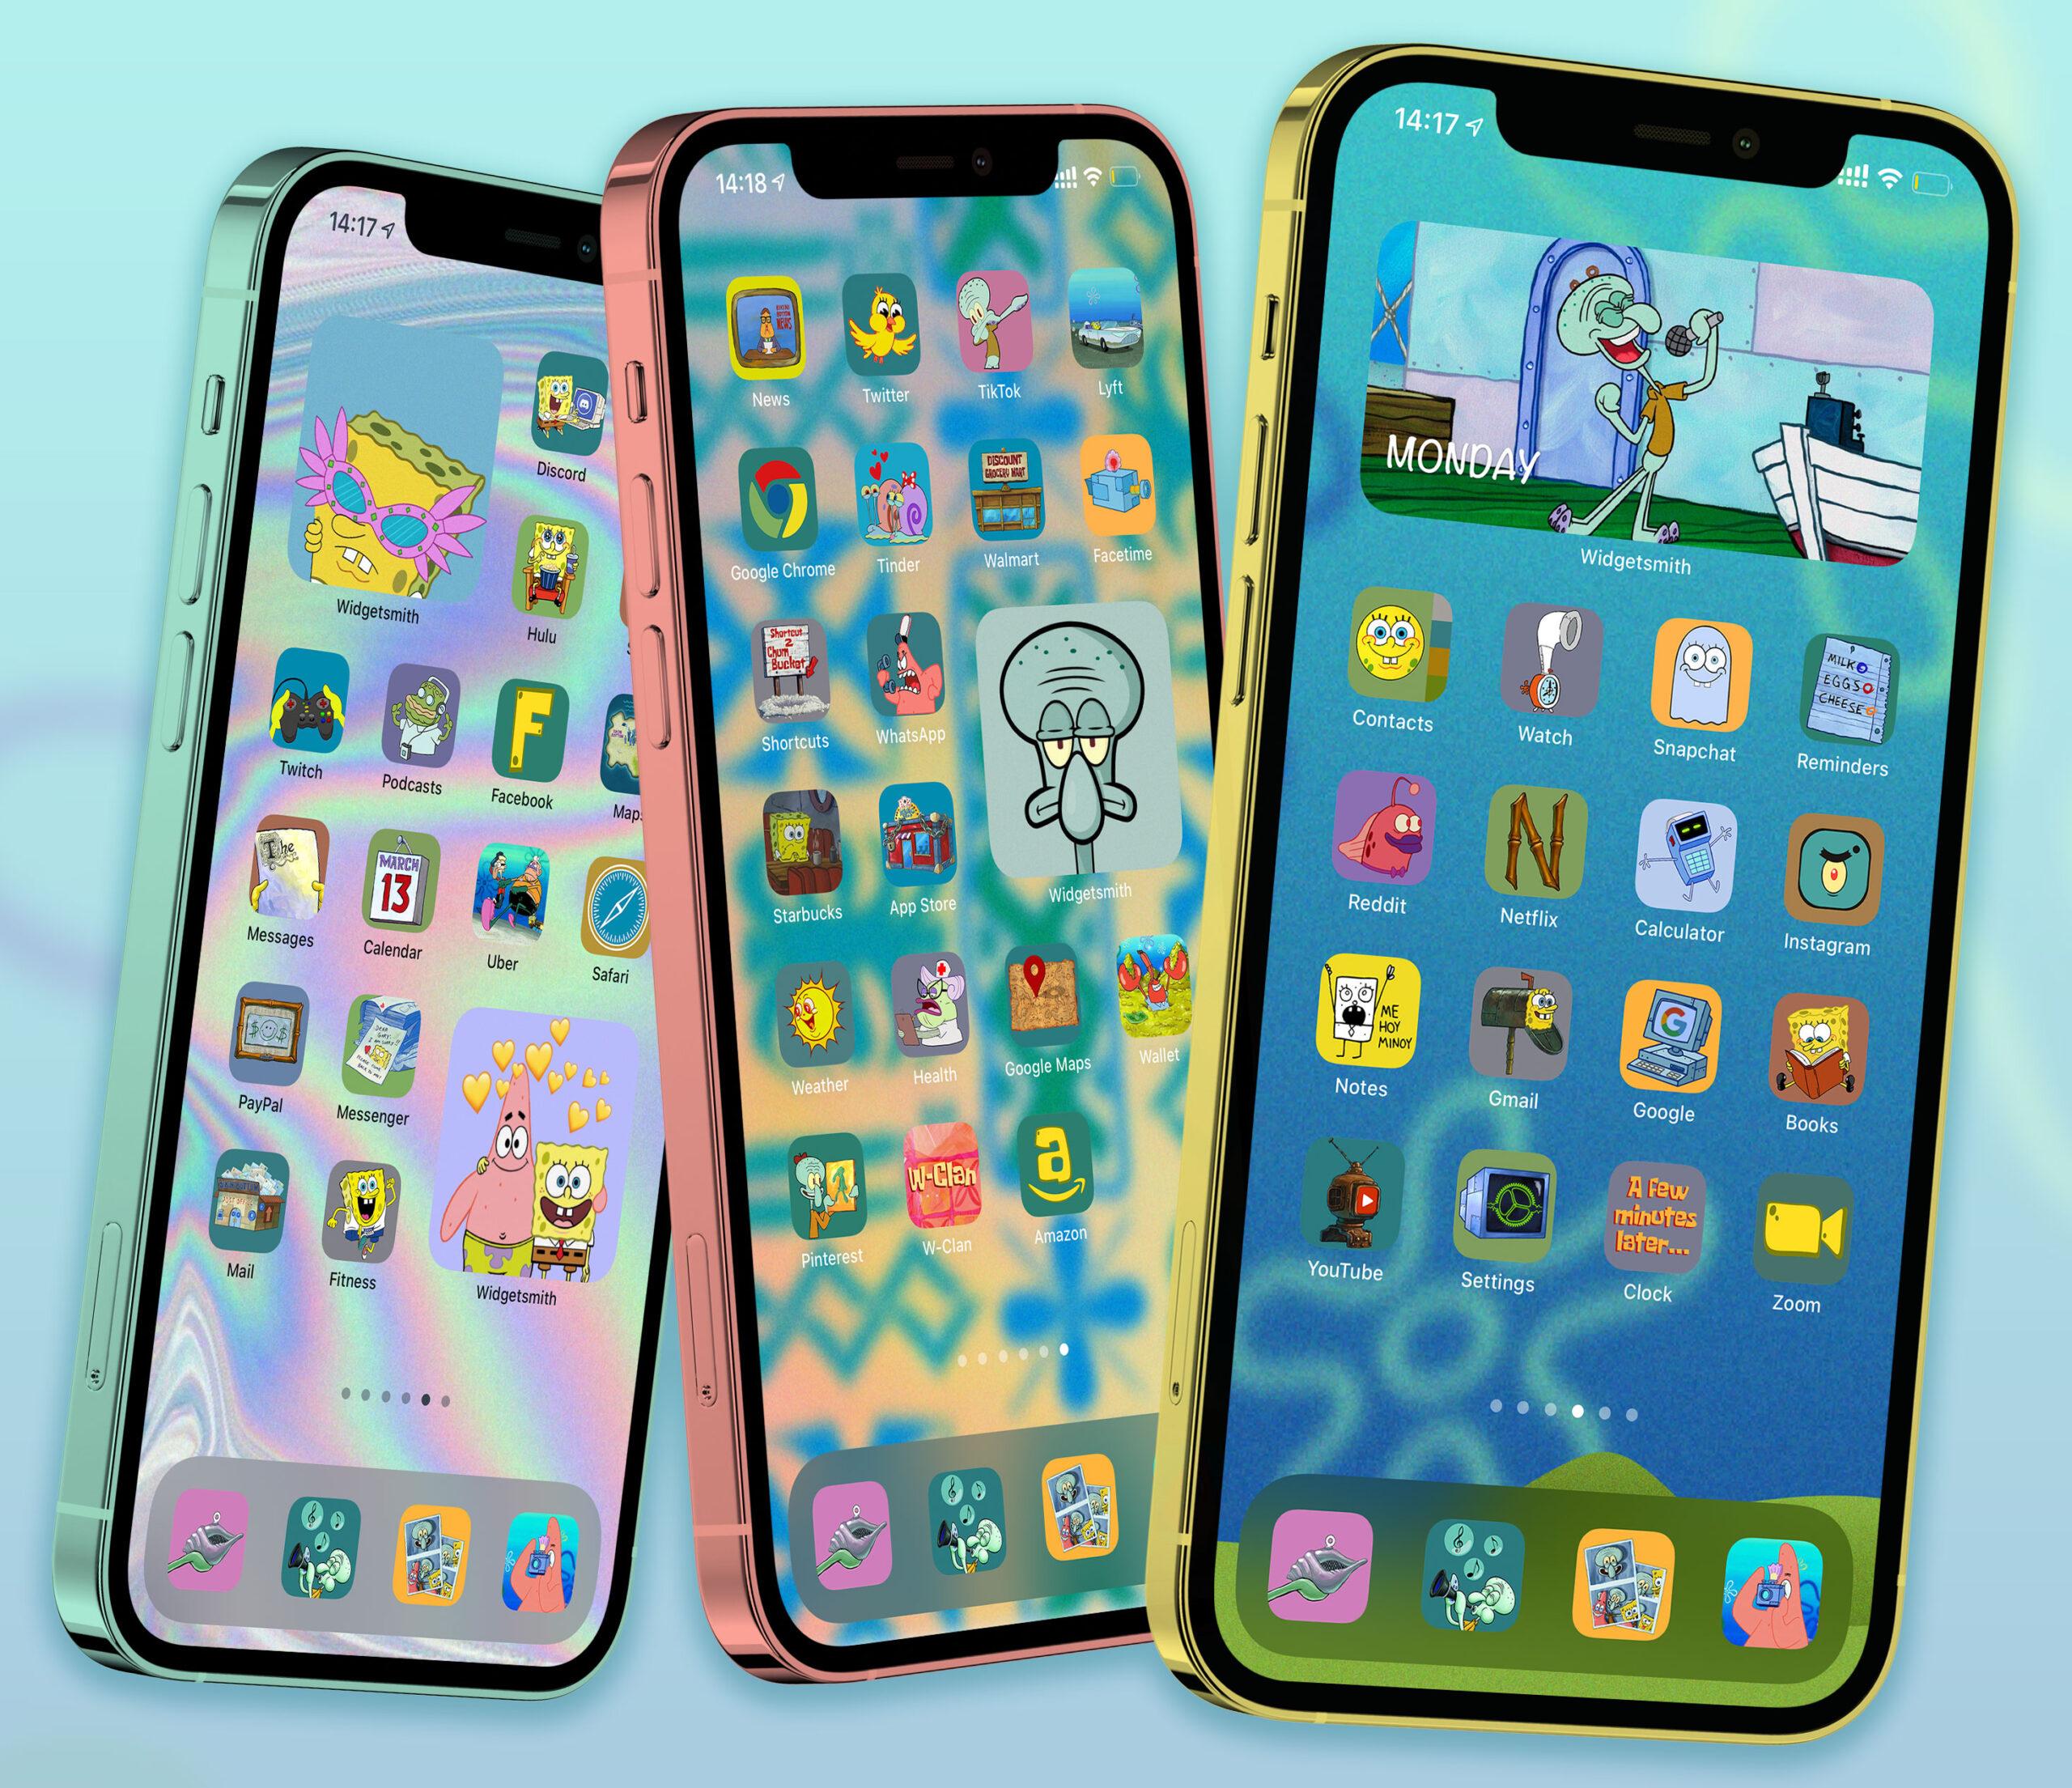 spongebob app icons pack preview 1